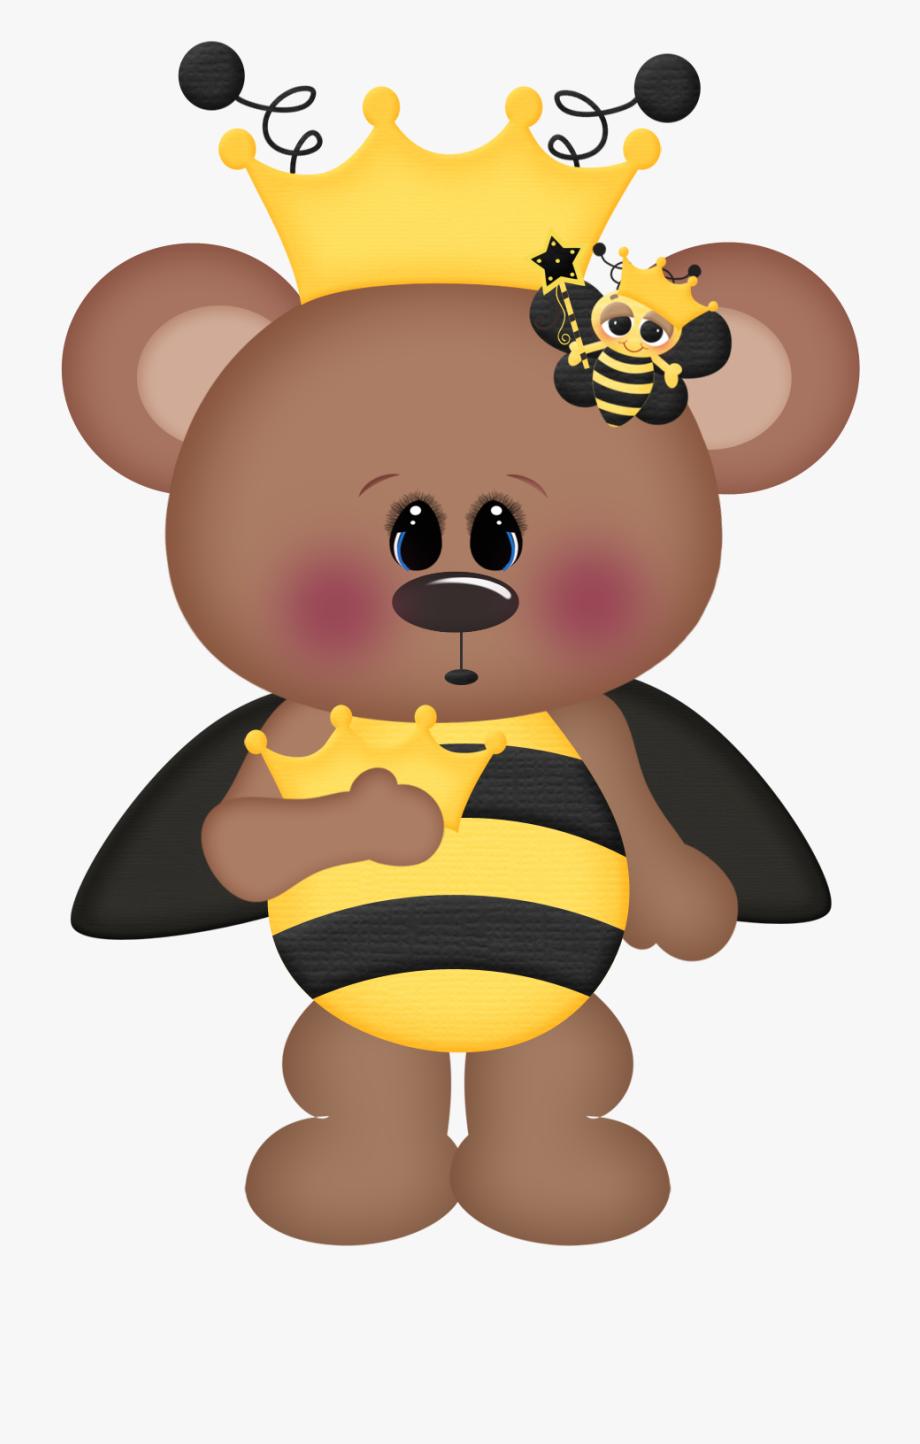 Clipart bee bear. Photo by daniellemoraesfalcao